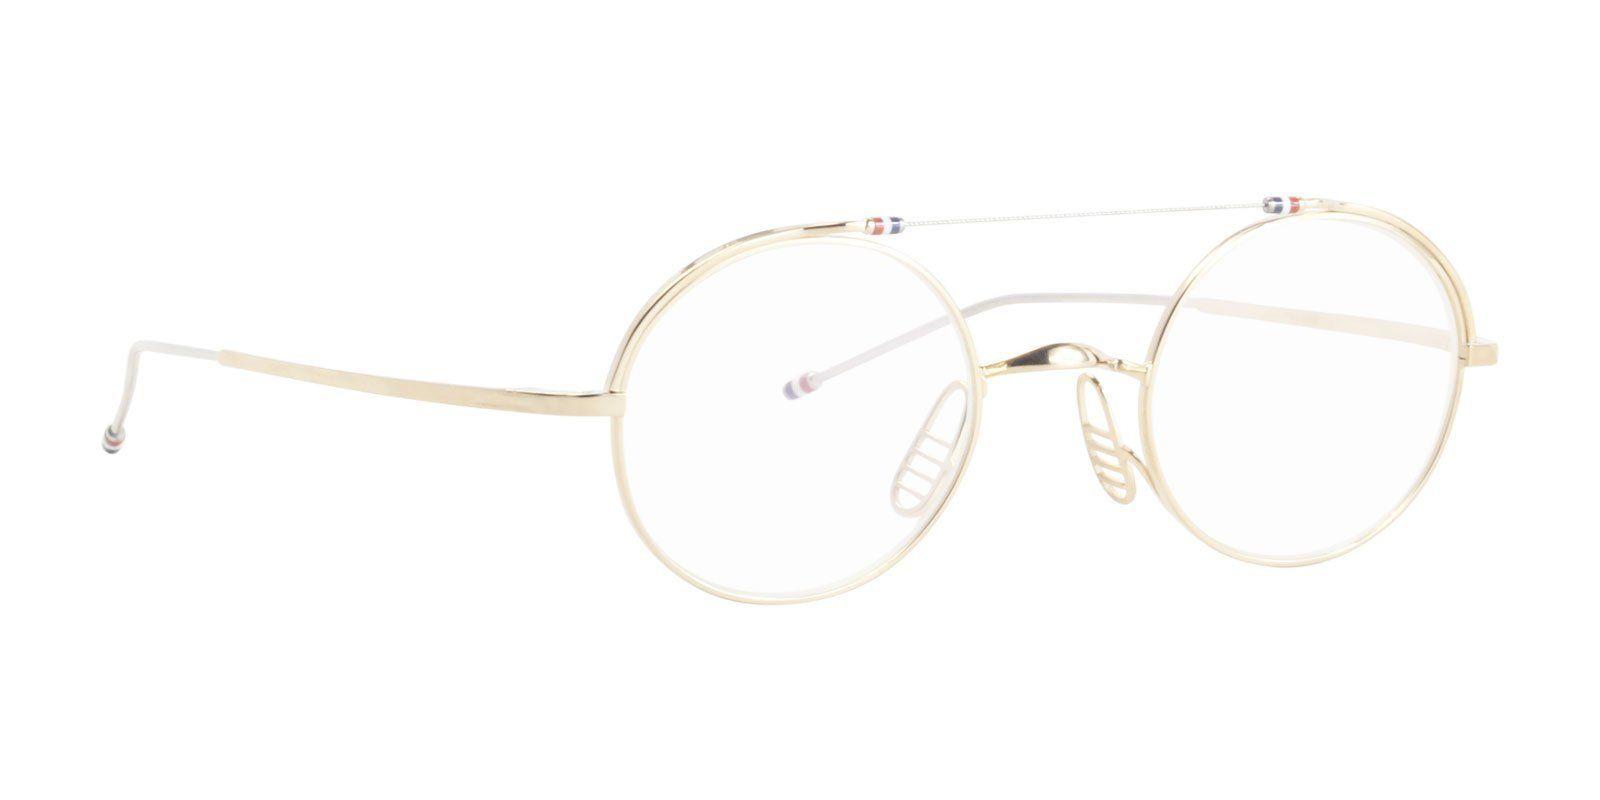 57daa77733c0 Thom Browne - TB-910 Silver White Gold-eyeglasses-Designer Eyes ...